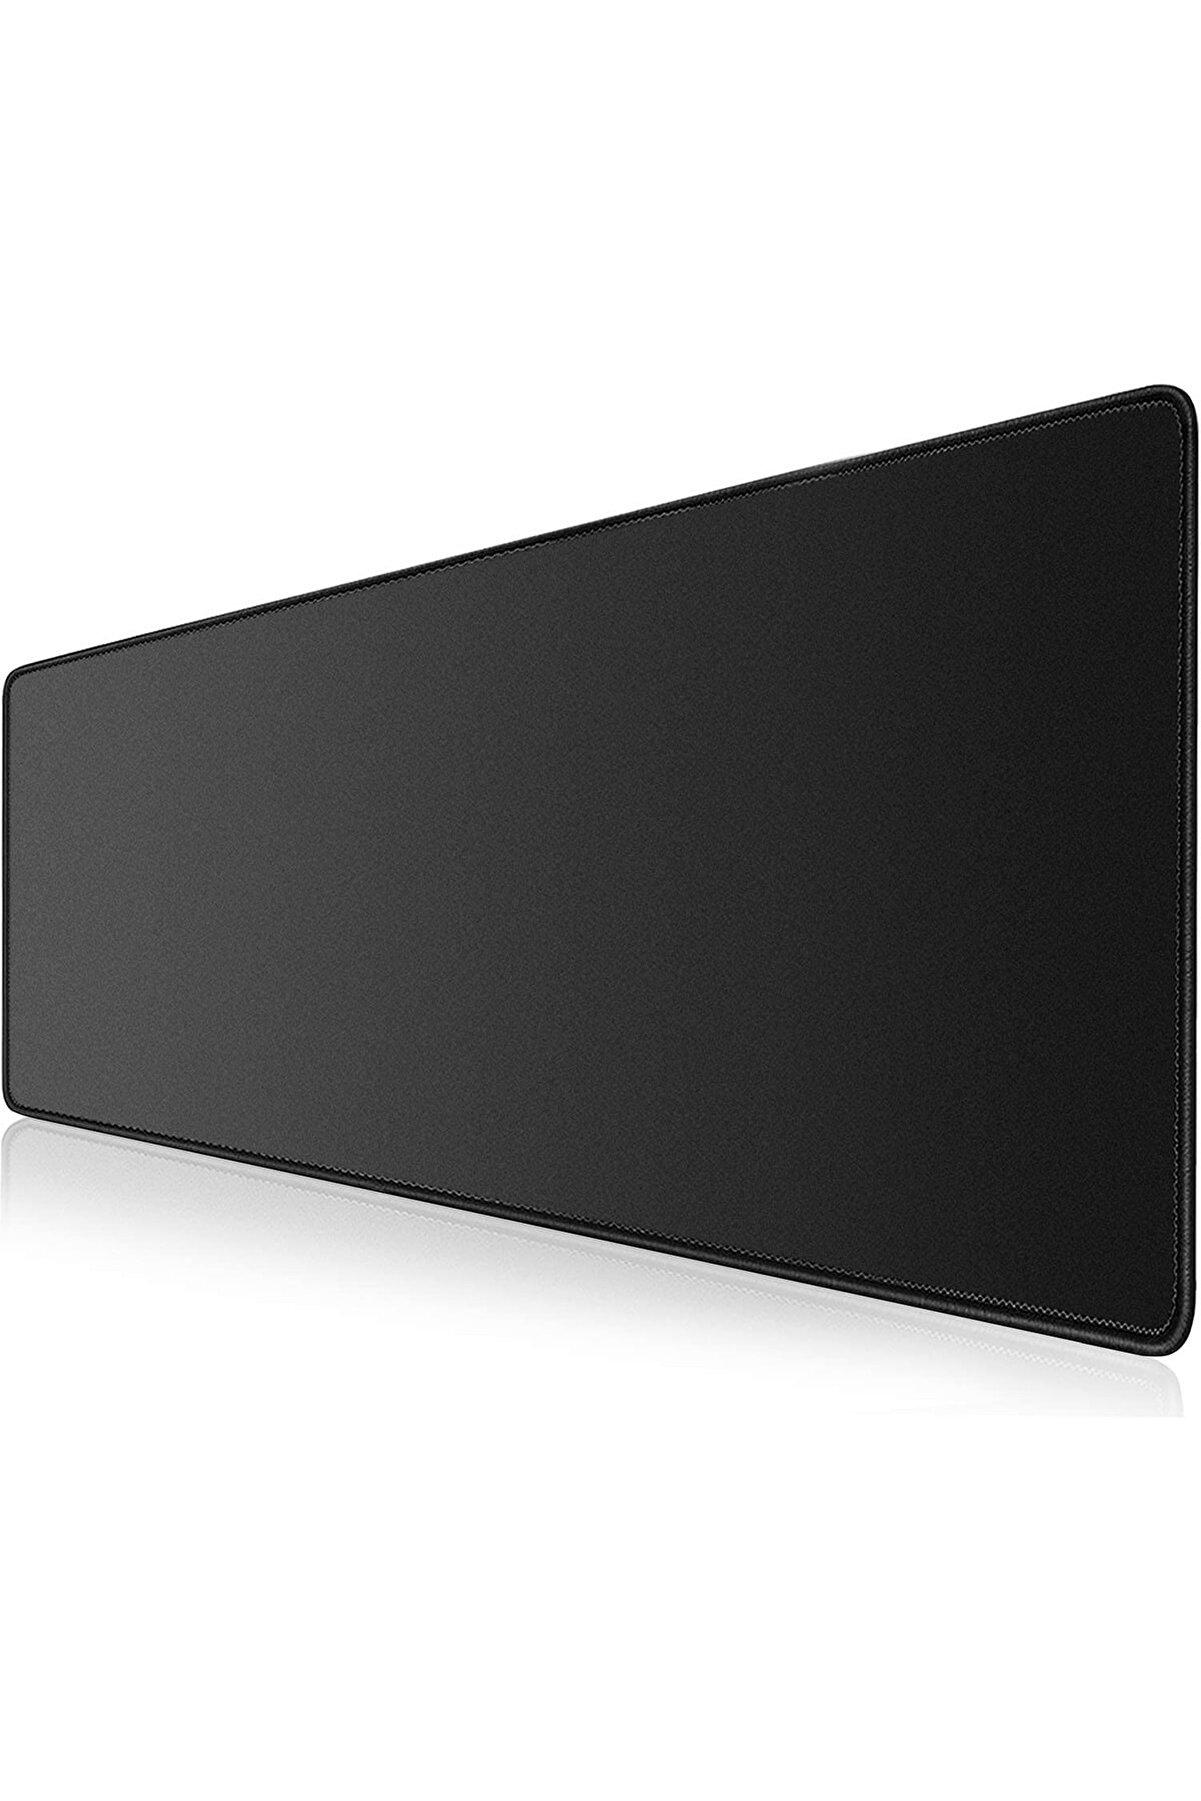 Xrades Siyah 90x40 Cm Xxl Gaming Oyuncu Mousepad